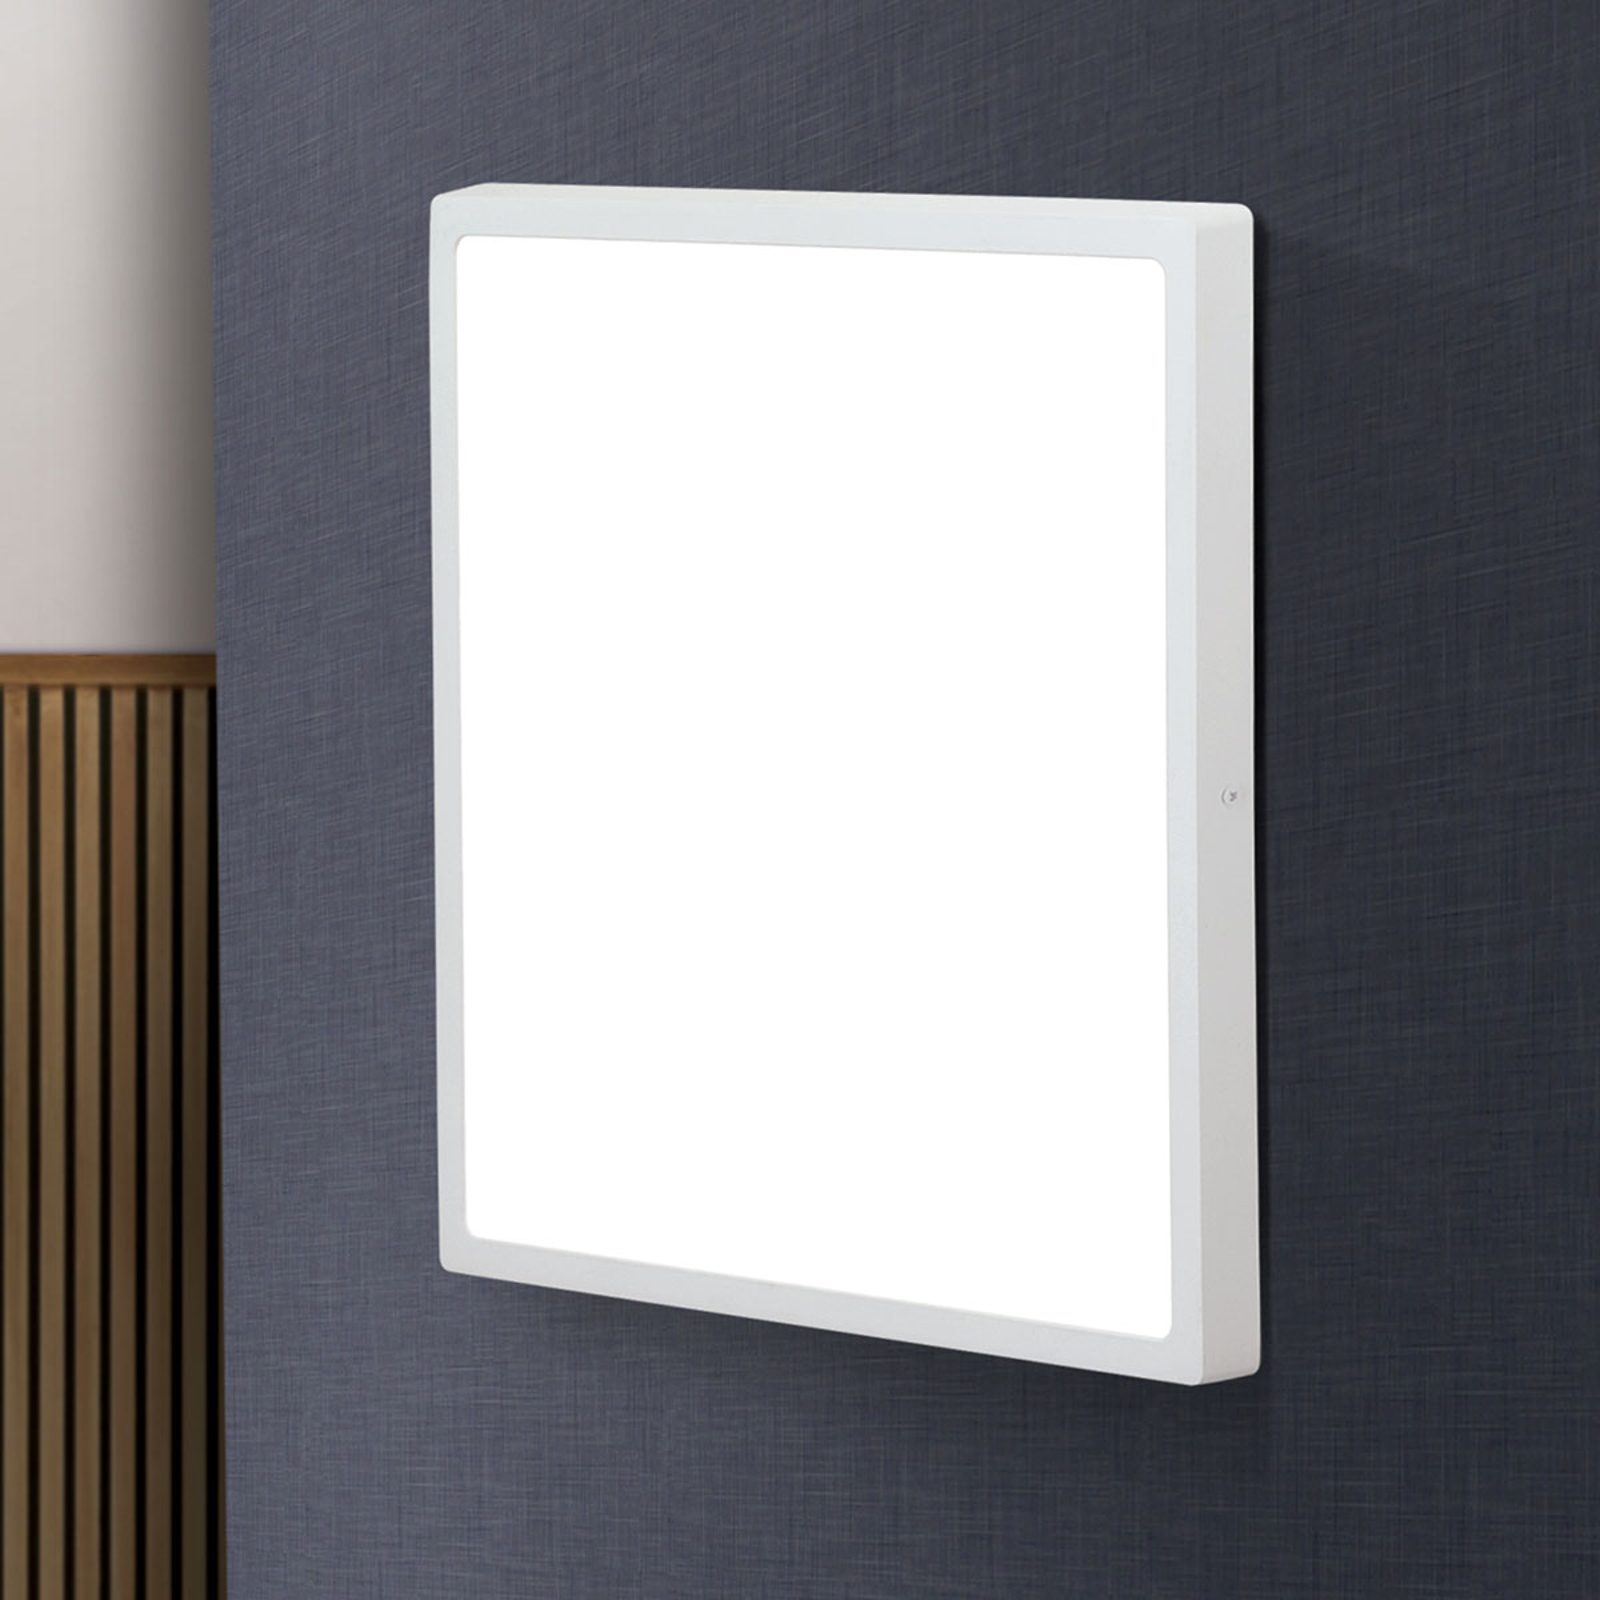 Plafonnier LED Lero angulaire 40 x 40cm